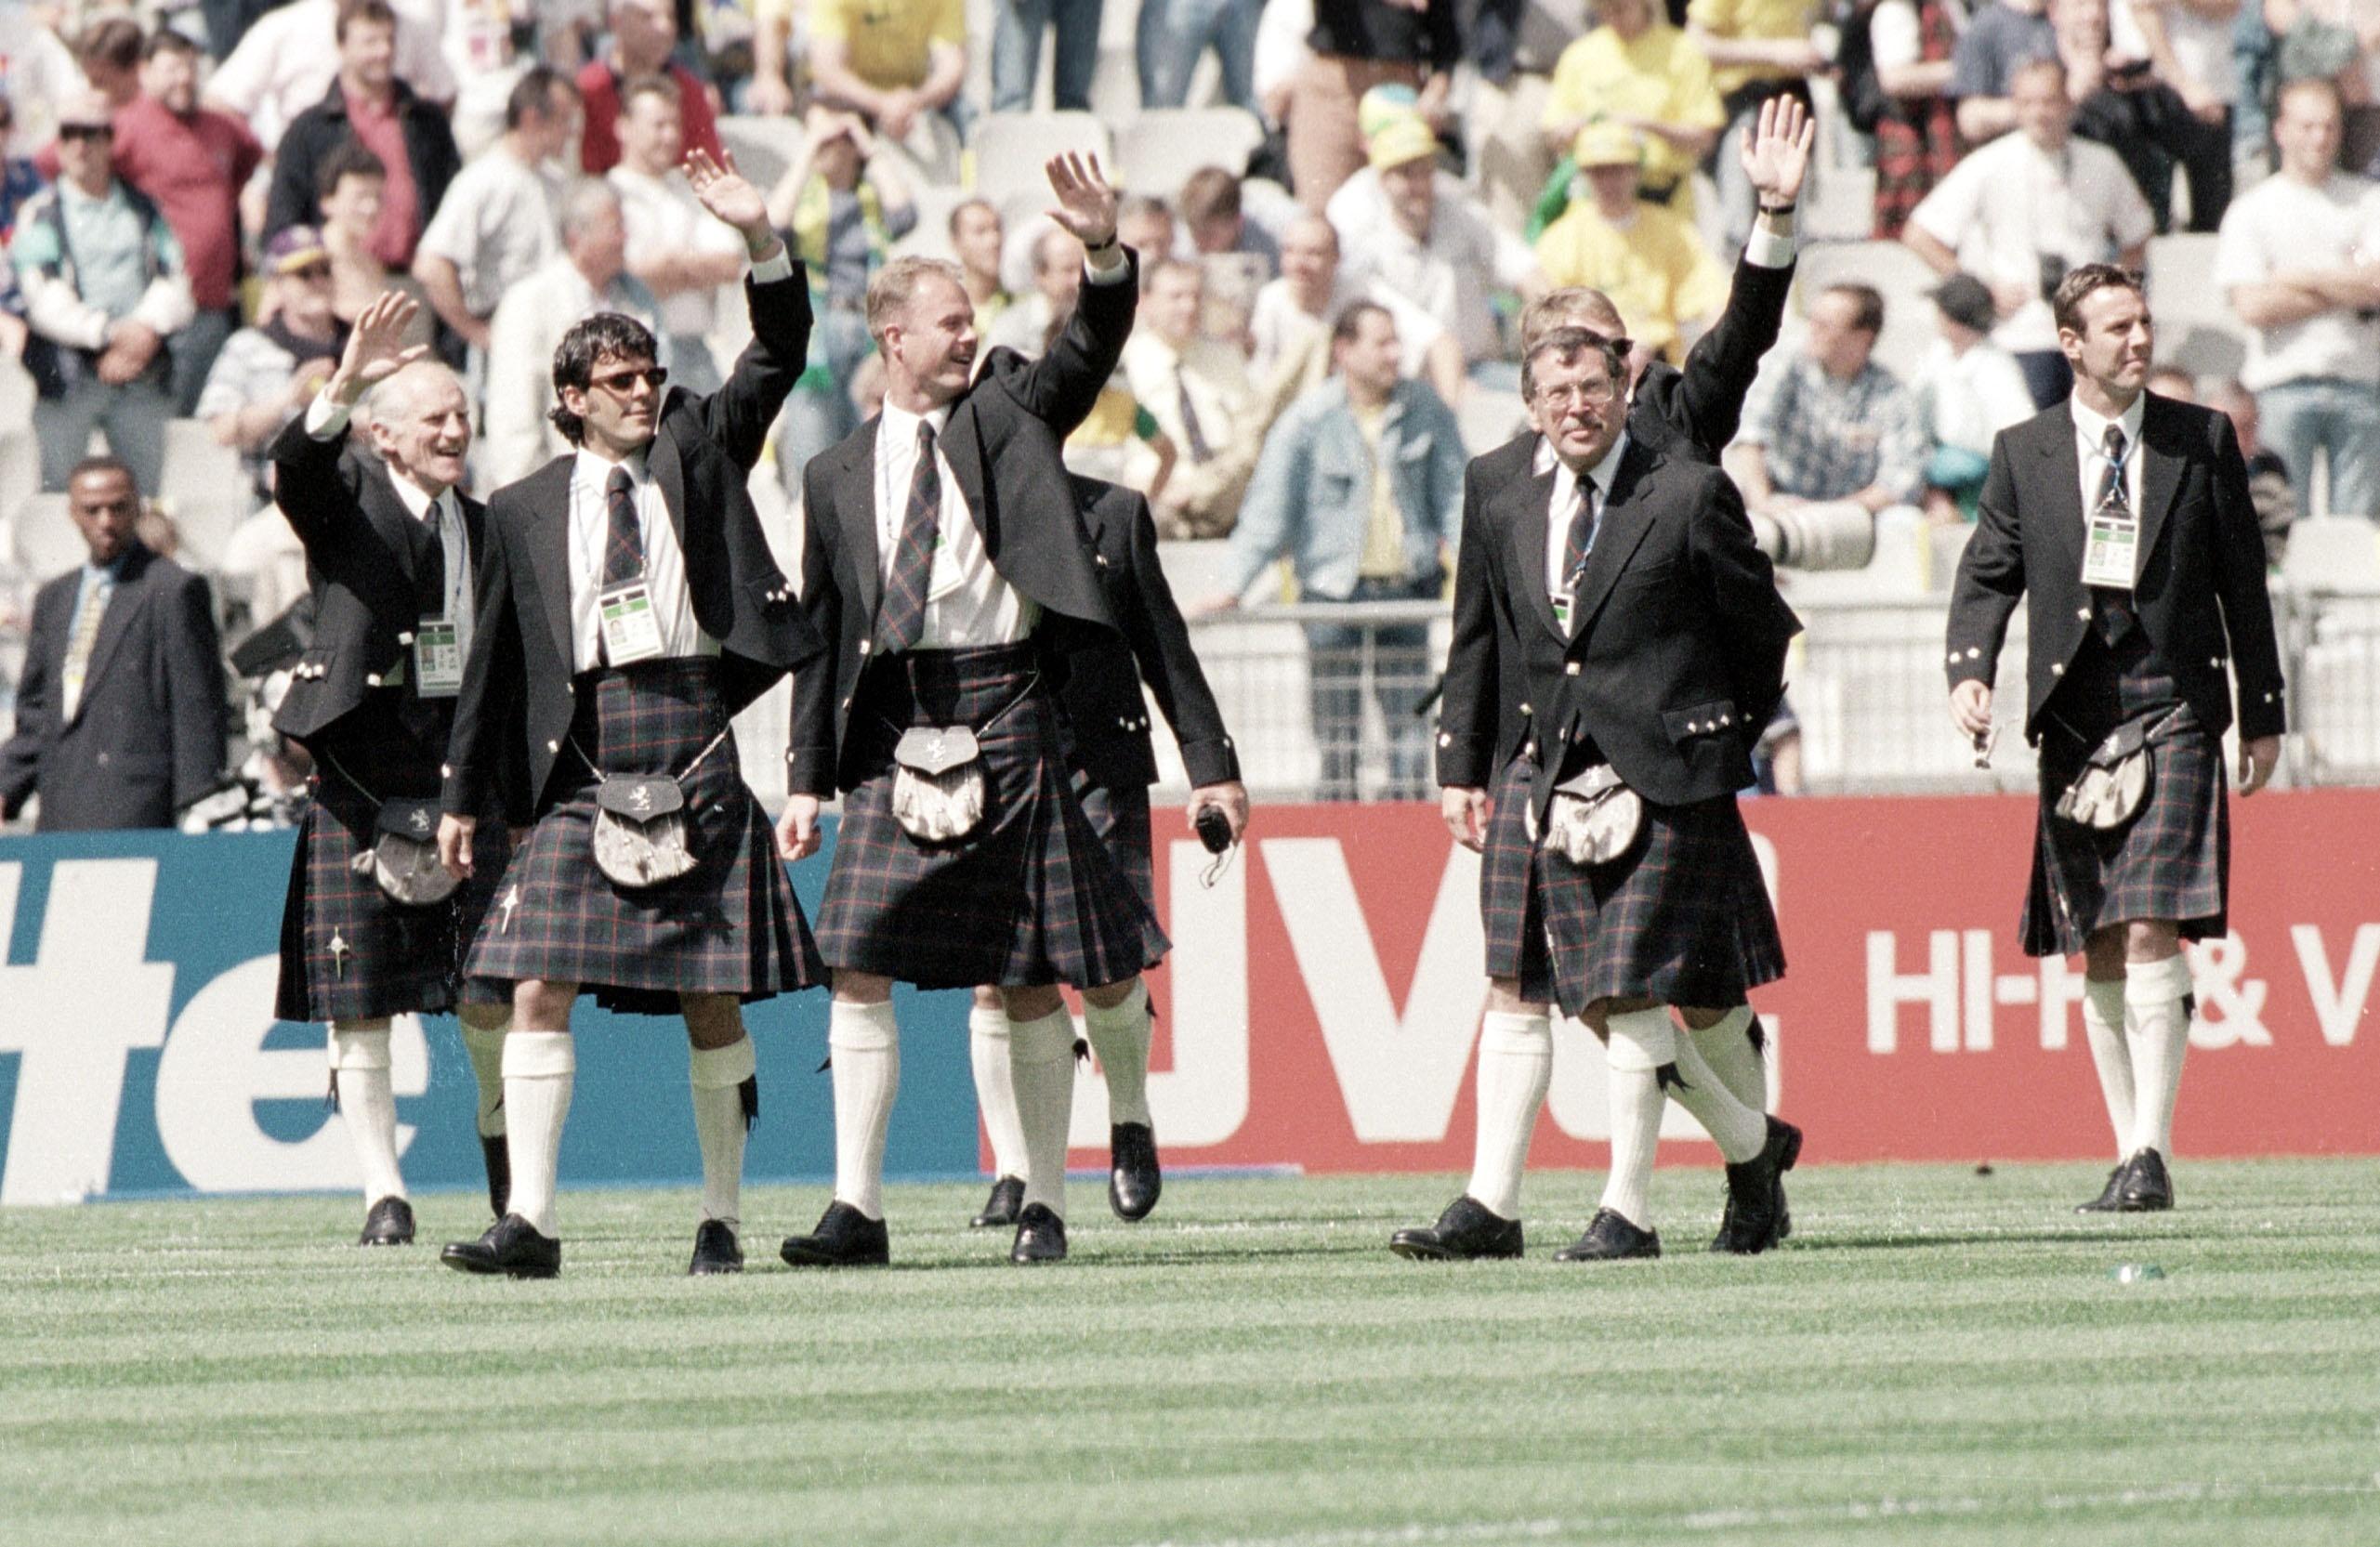 Scotland parade in their kilts prior to kick off.